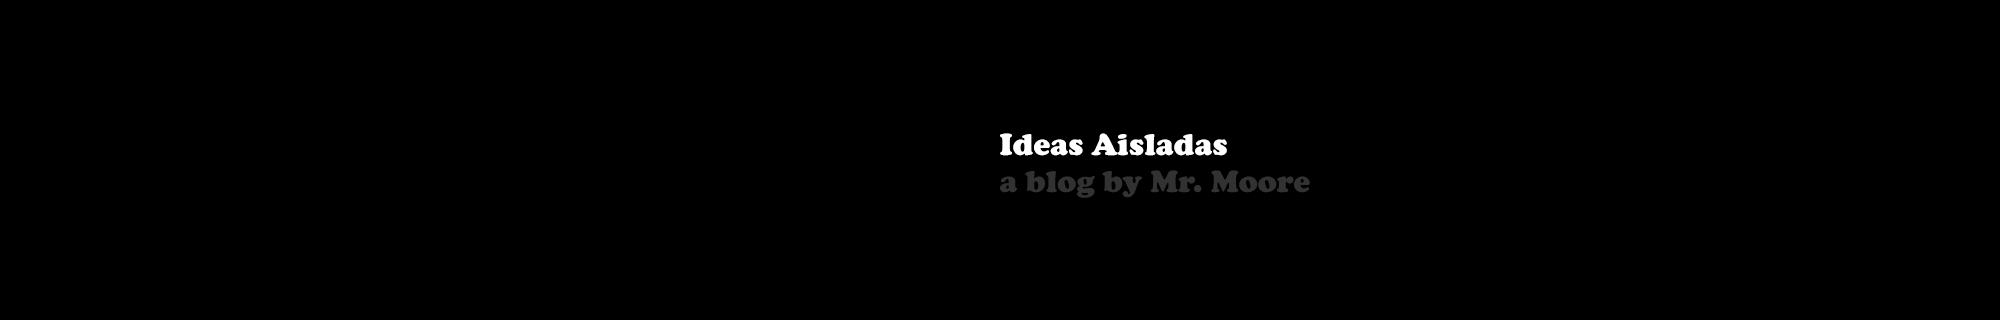 Ideas Aisladas